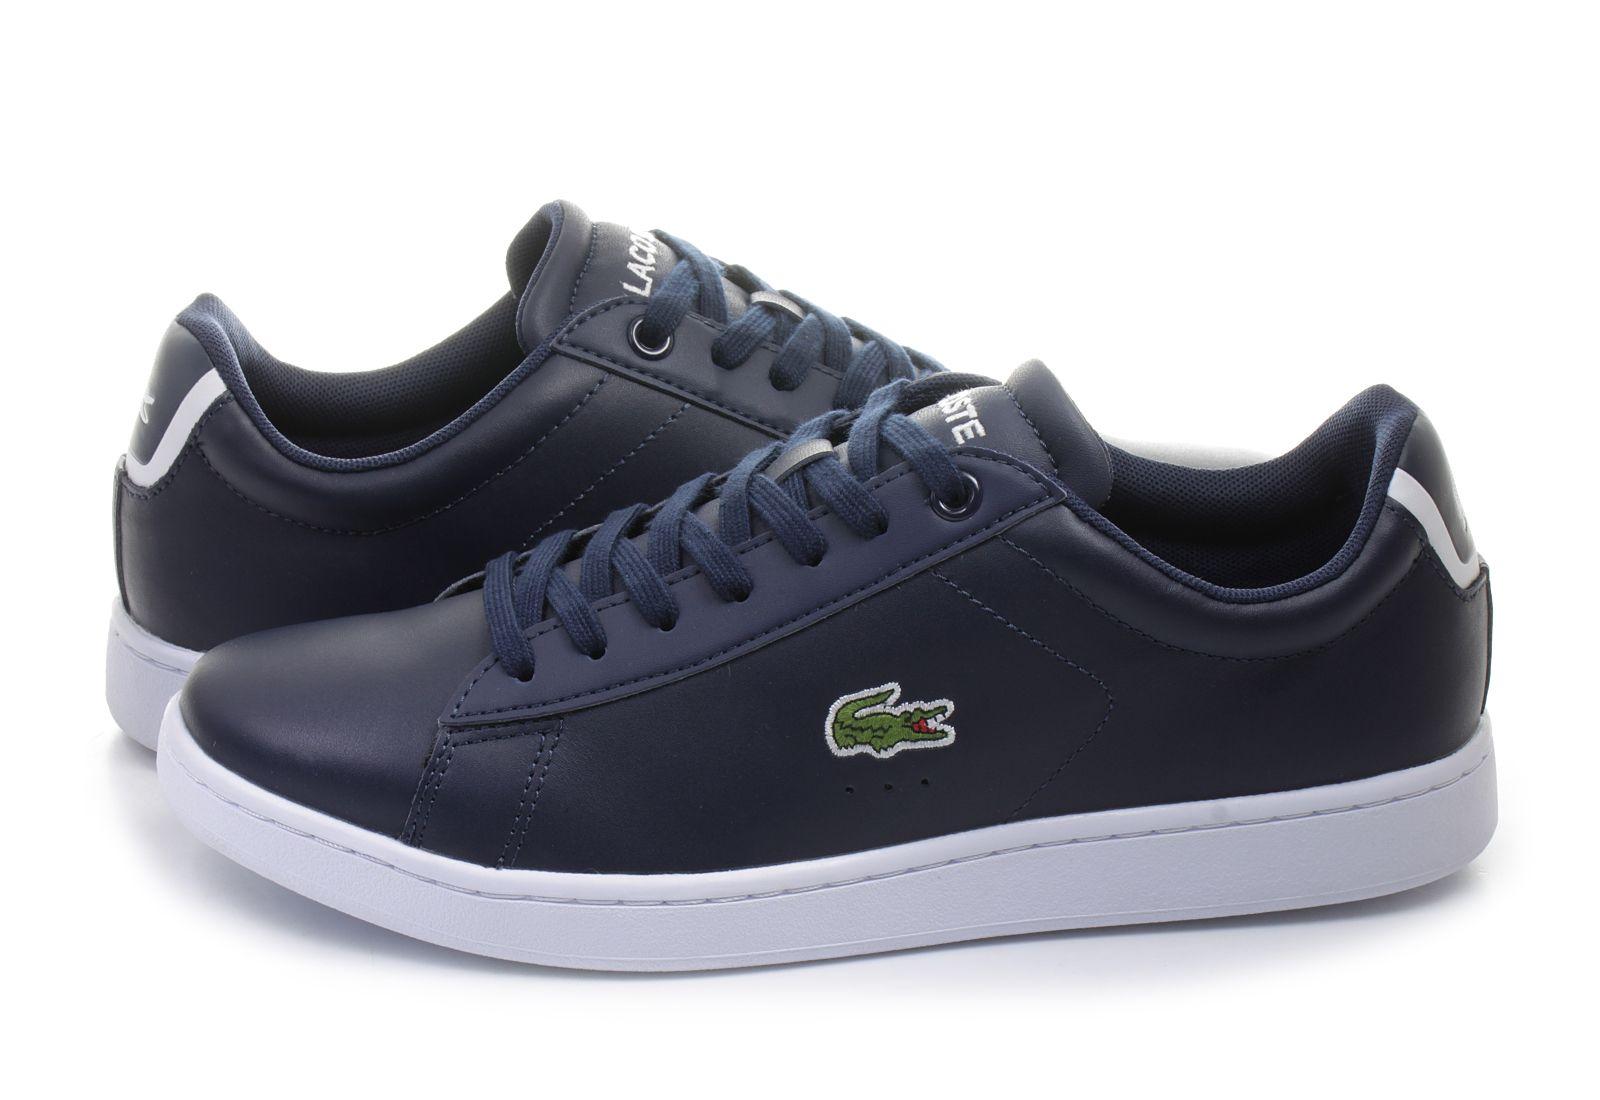 4db618651c Lacoste Nízké boty Carnaby Evo